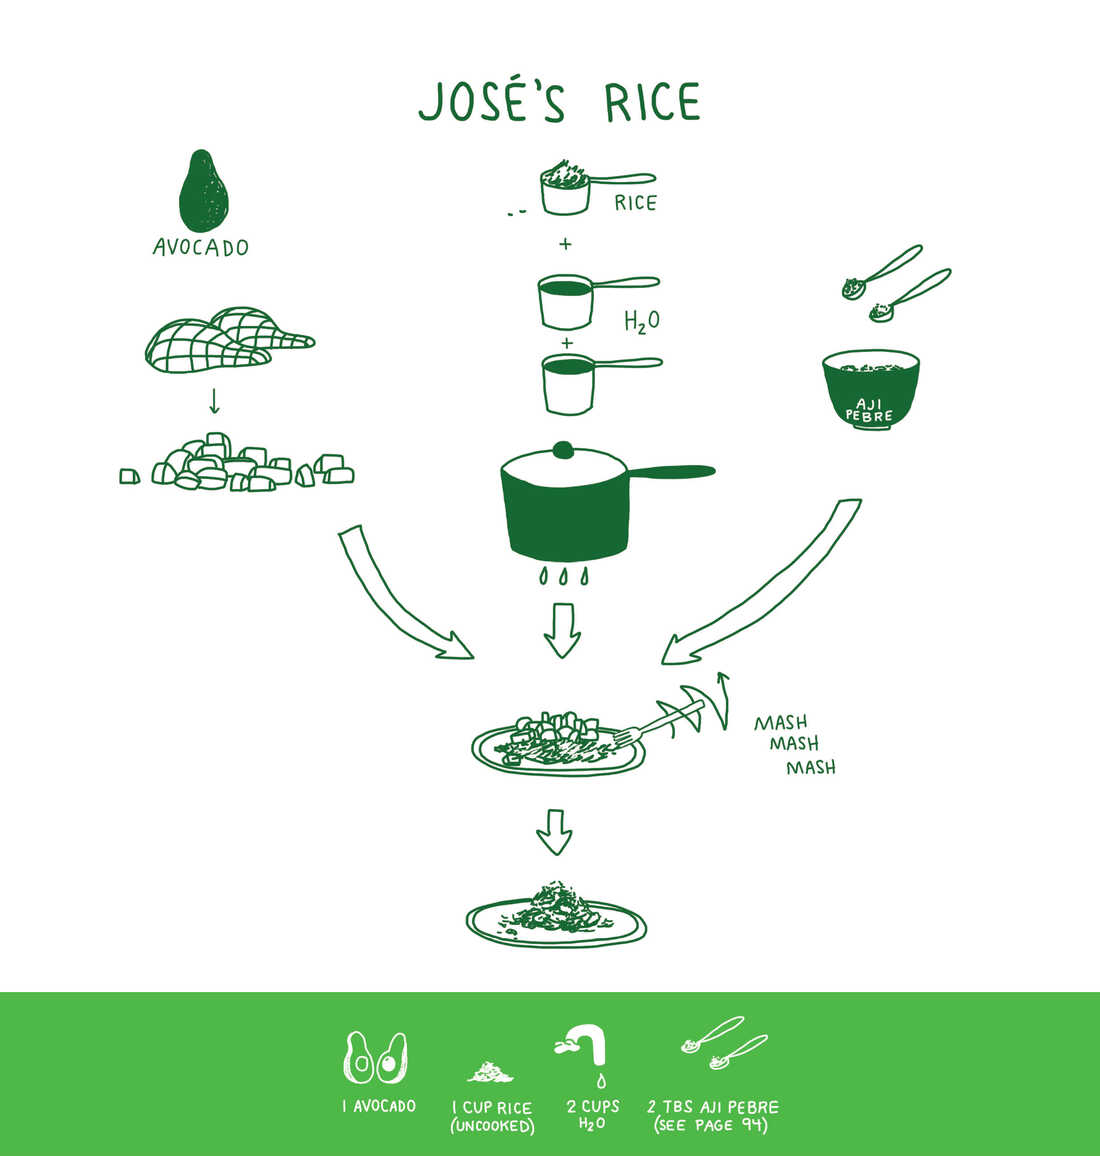 Jose's Rice Recipe